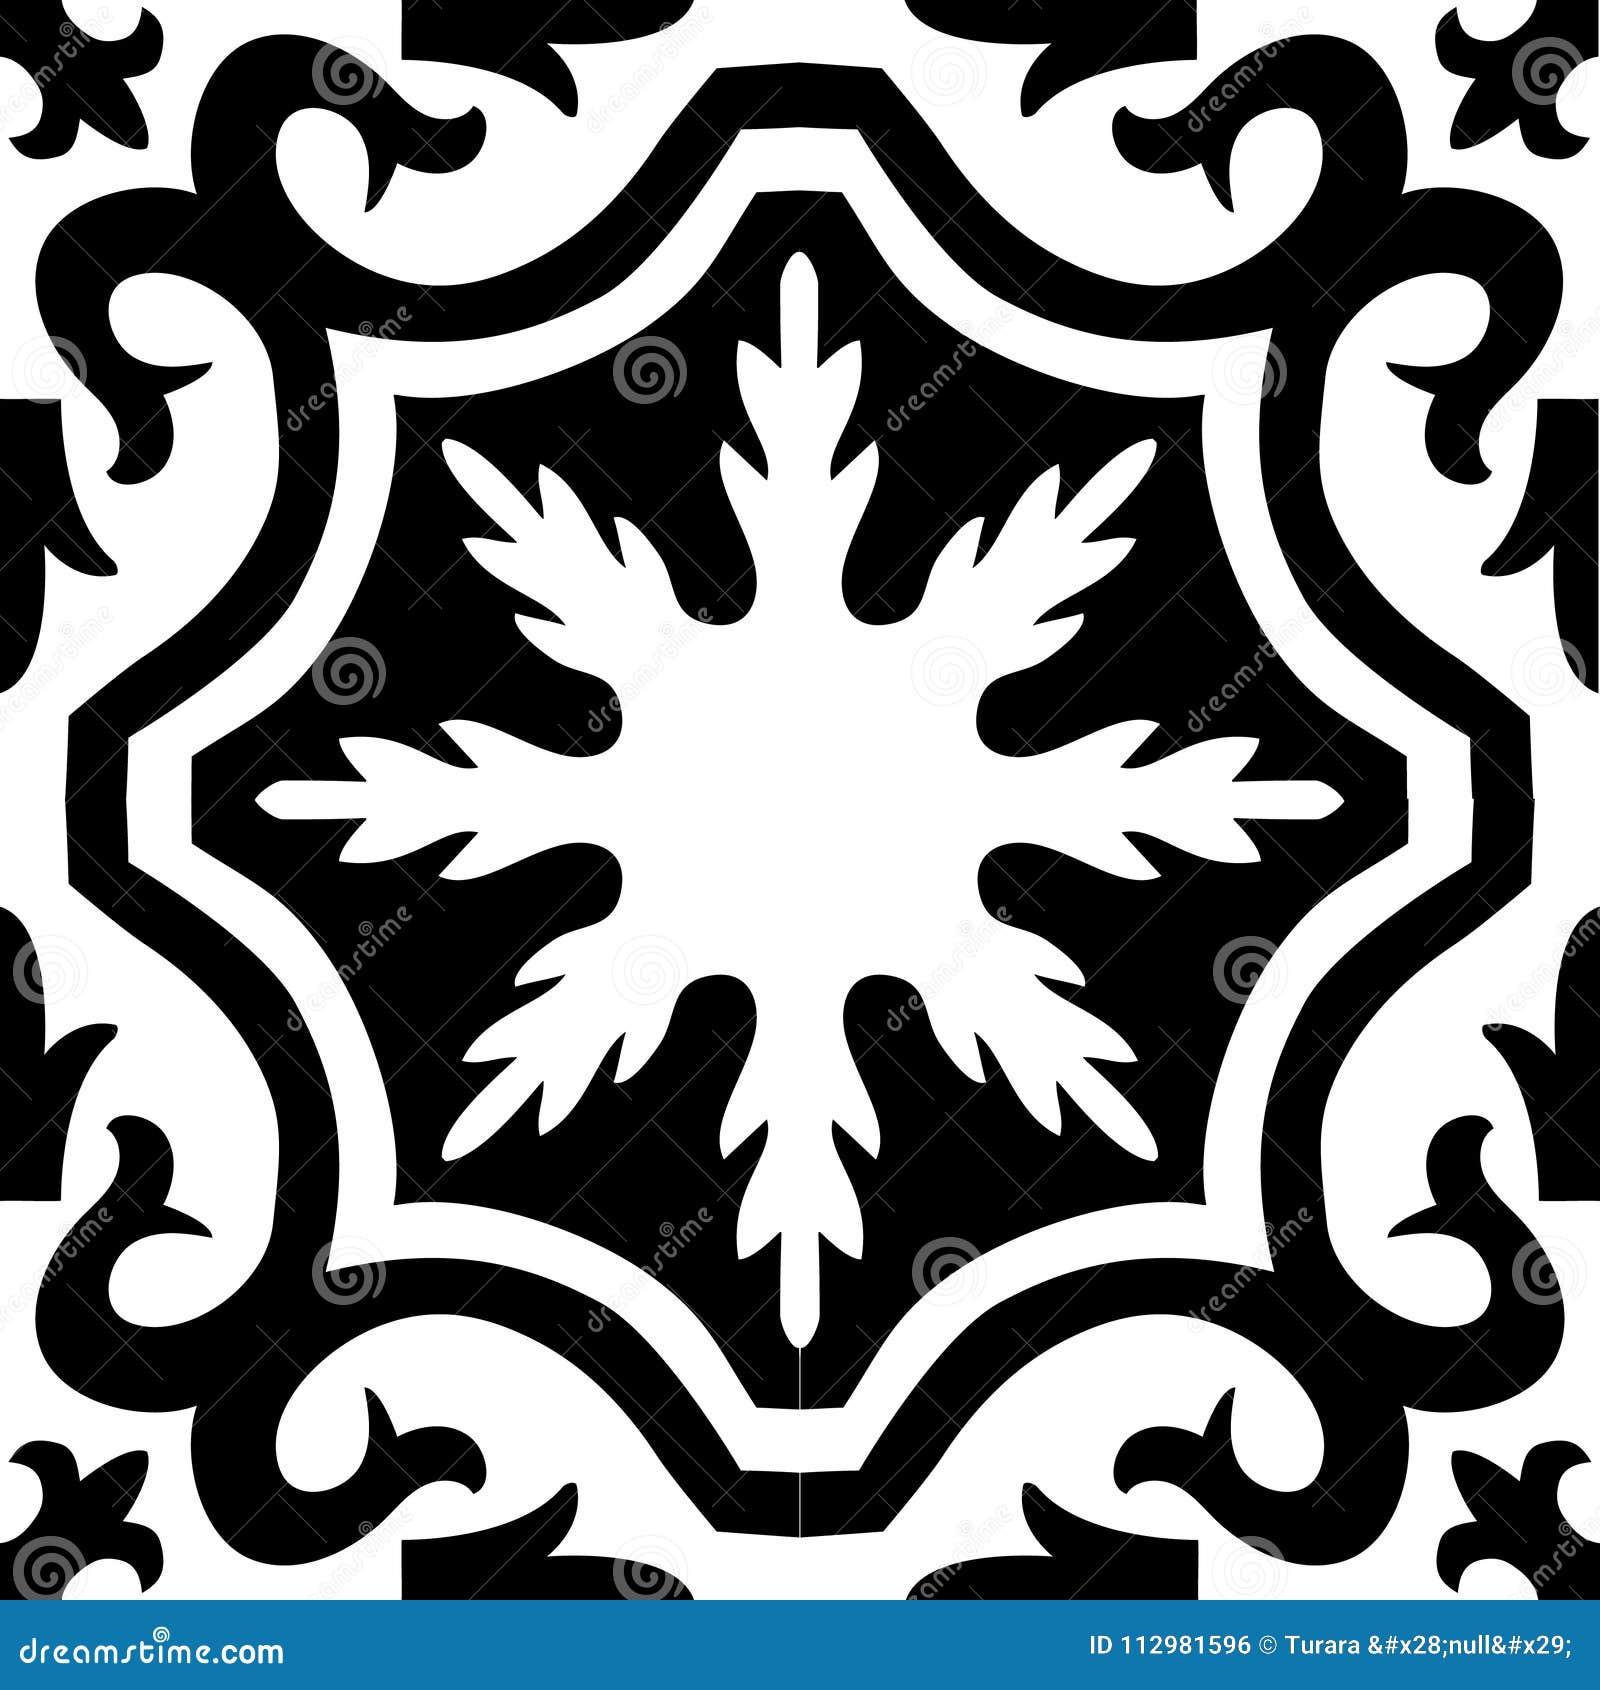 Mural black white ornament pattern